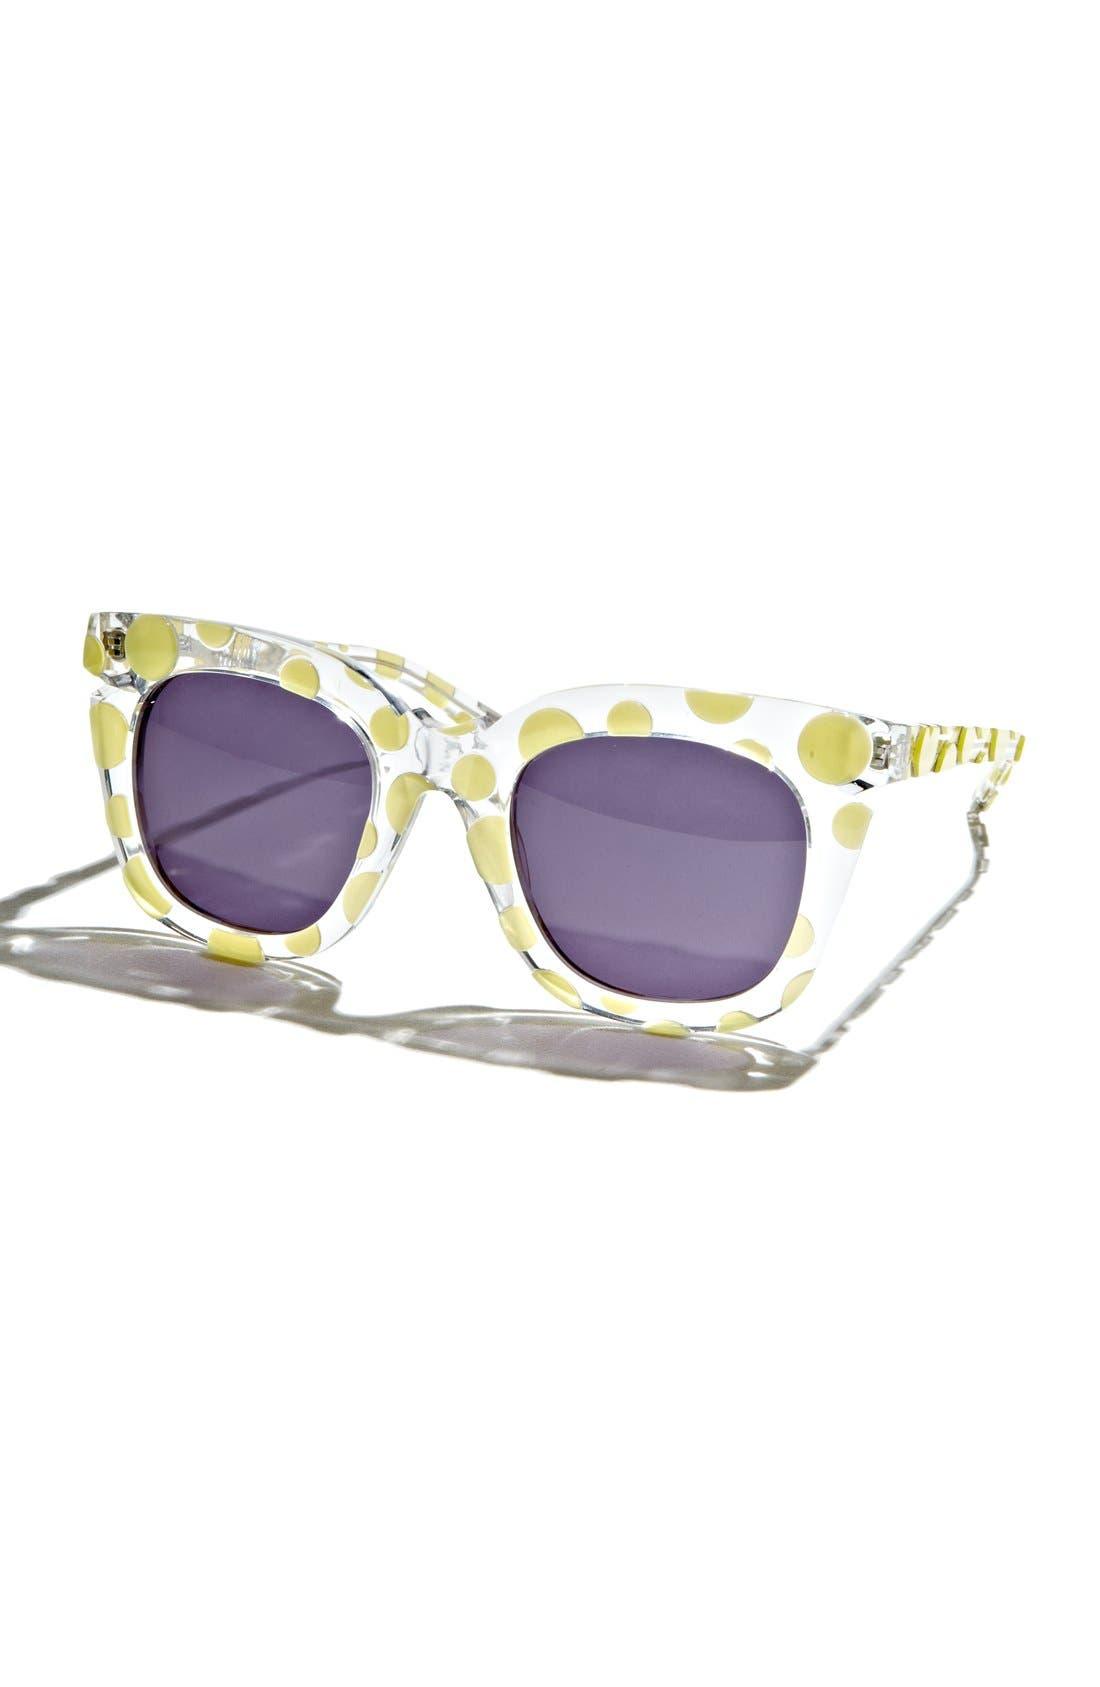 Main Image - Pared 'Pools & Palms - Clear & Sunny Polka Dot' 50mm Sunglasses